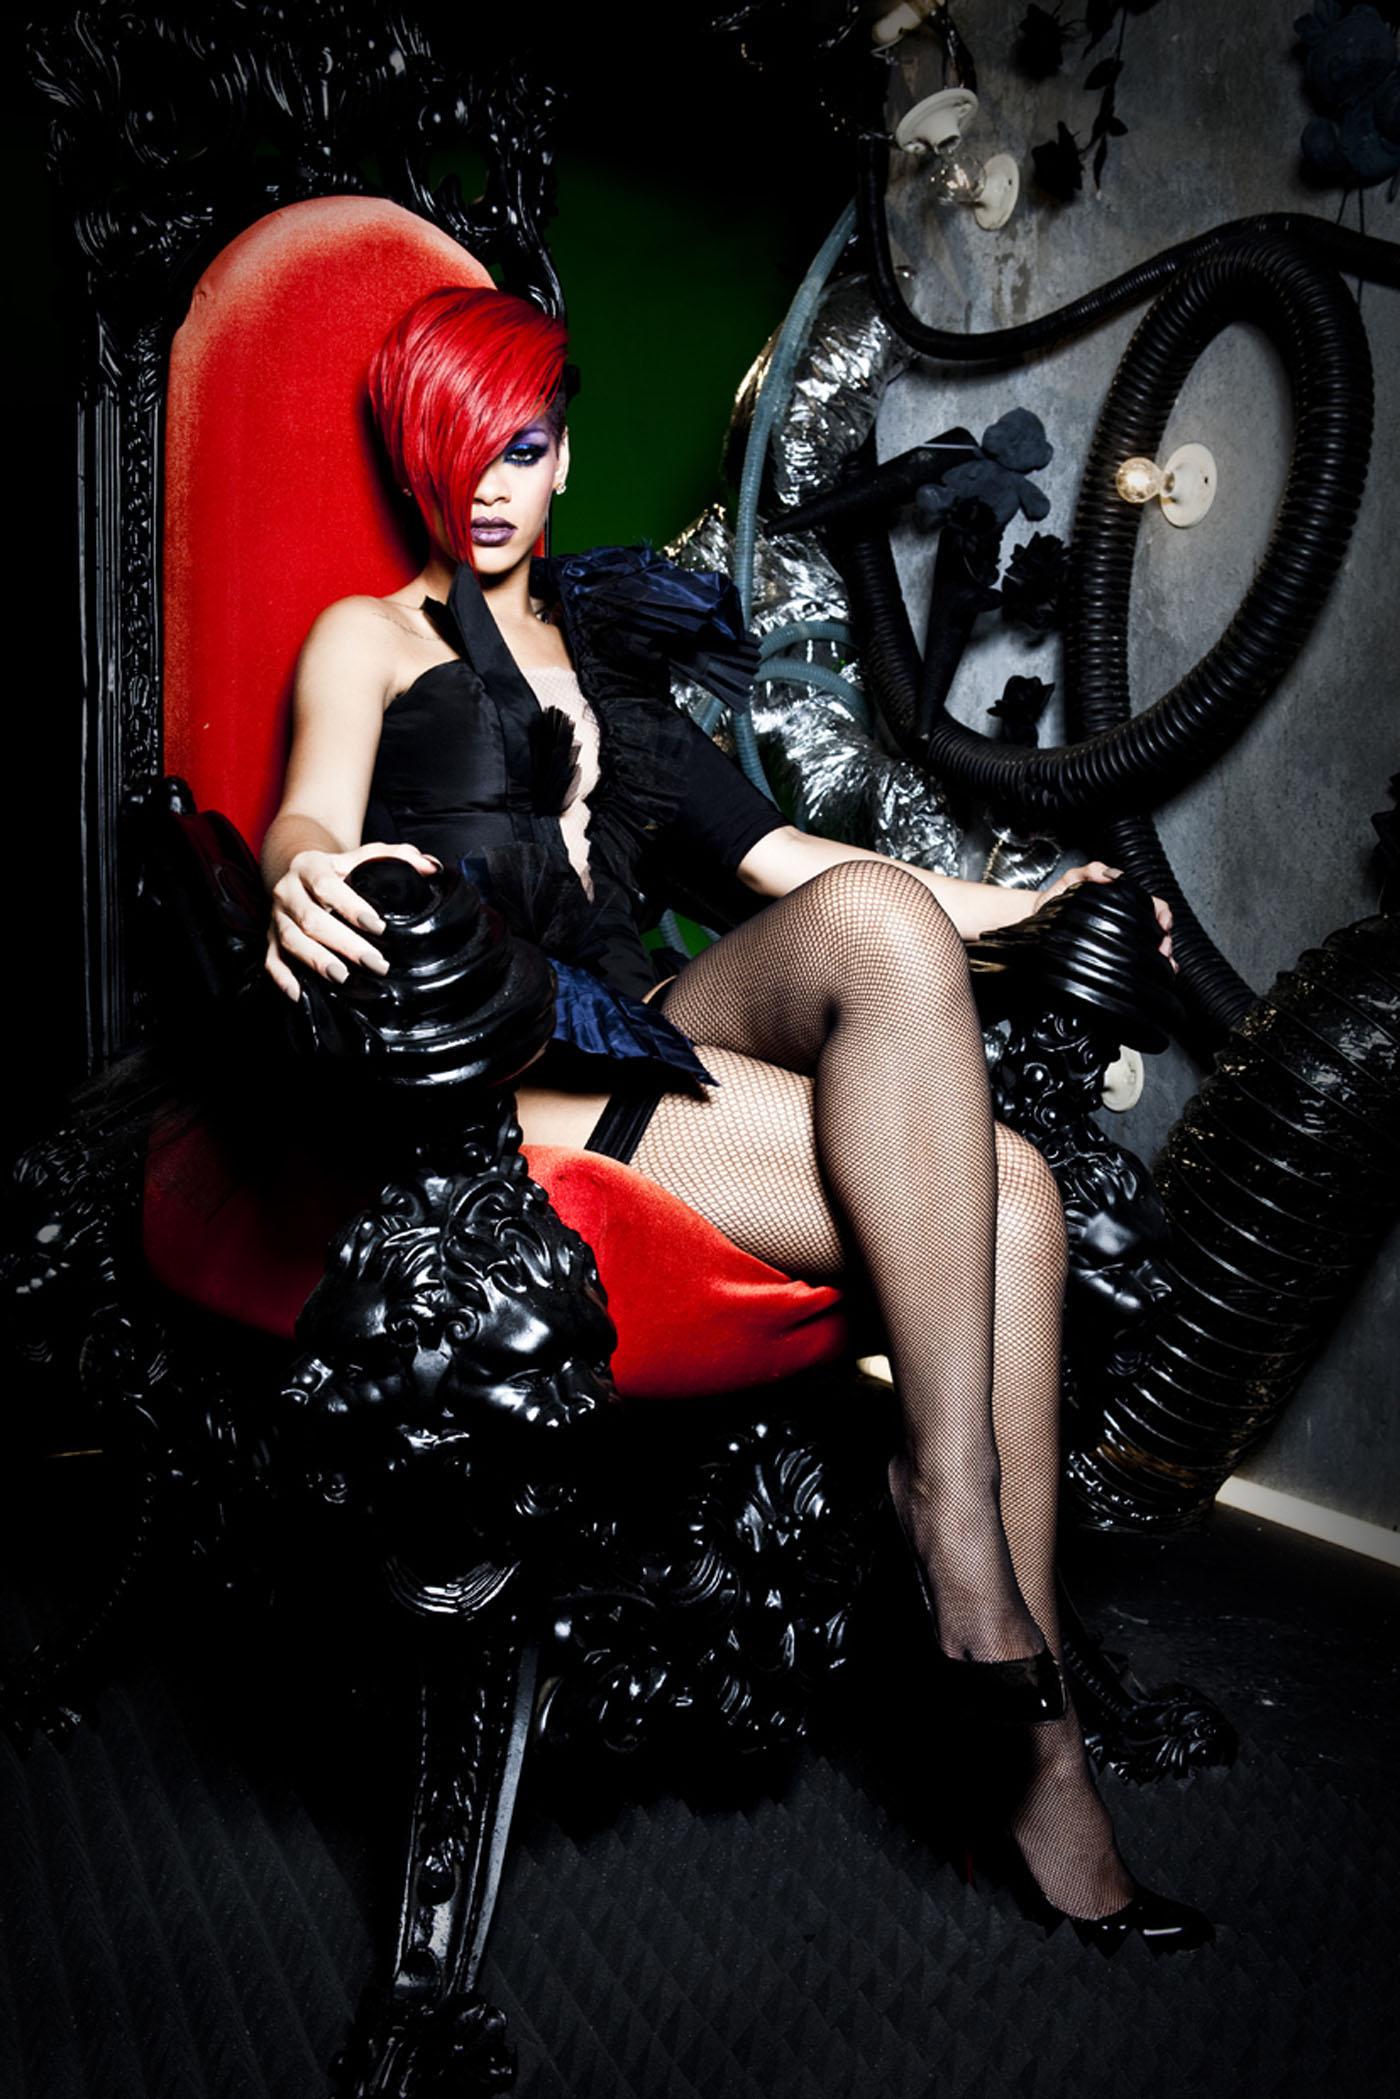 64765_RihannaWhosThatChickShoot4_122_428lo.jpg